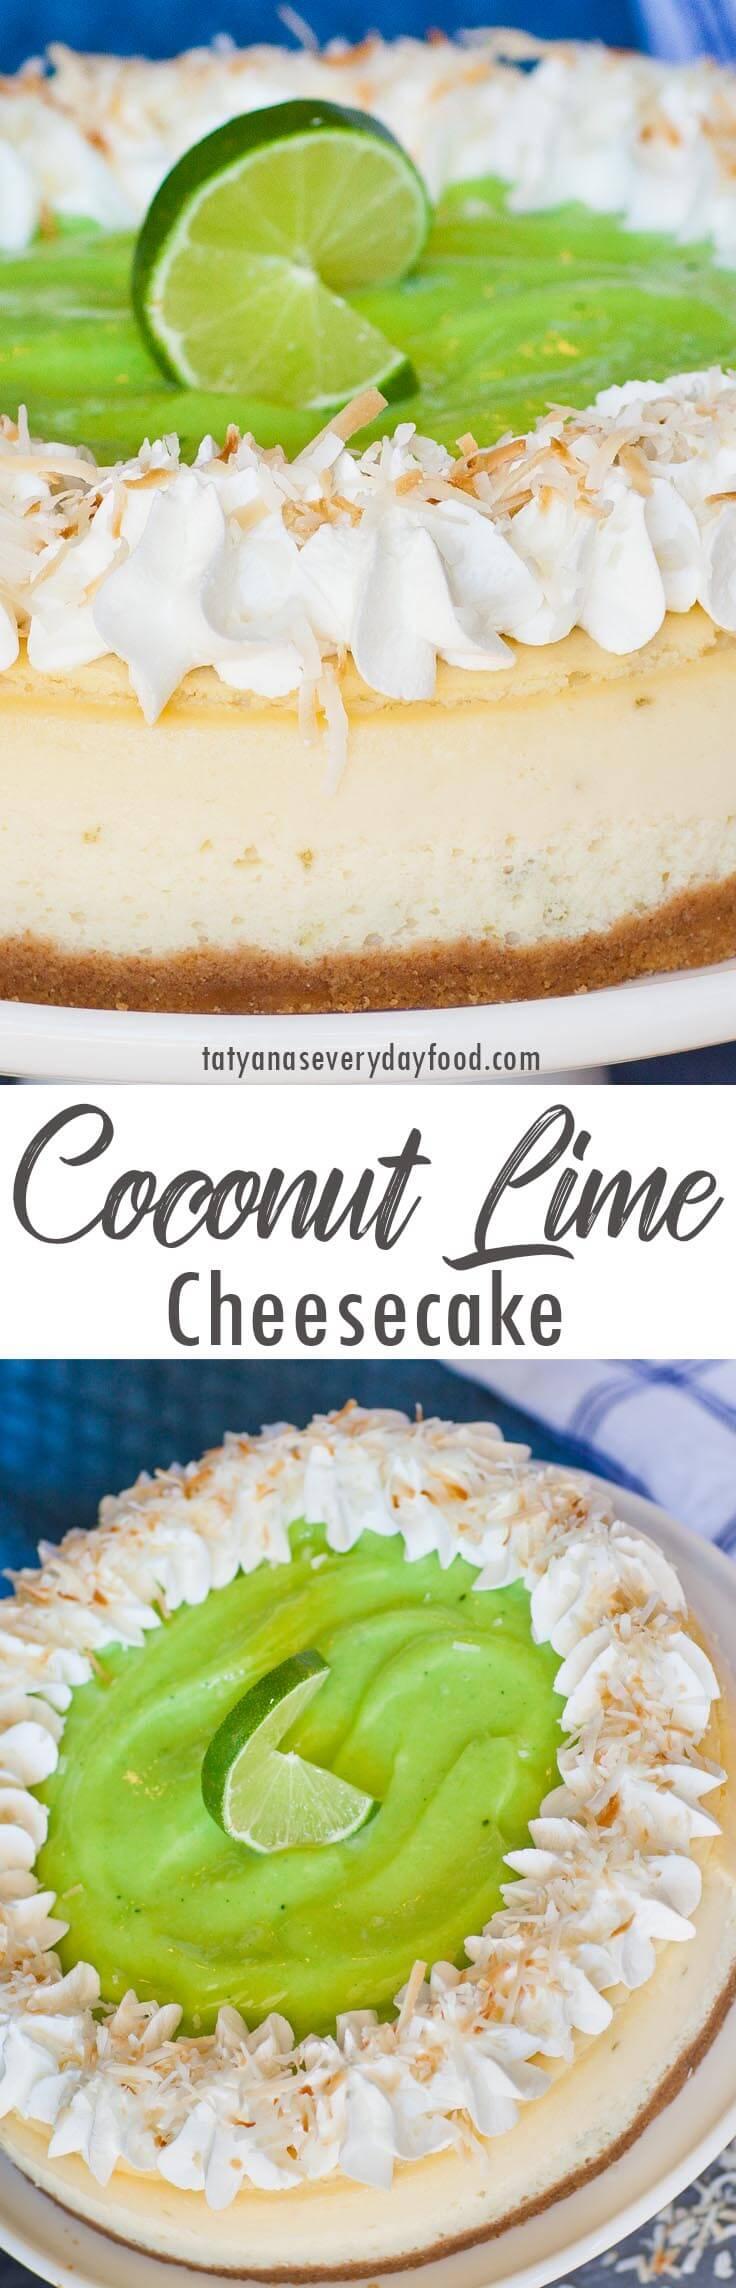 Coconut Lime Cheesecake video recipe